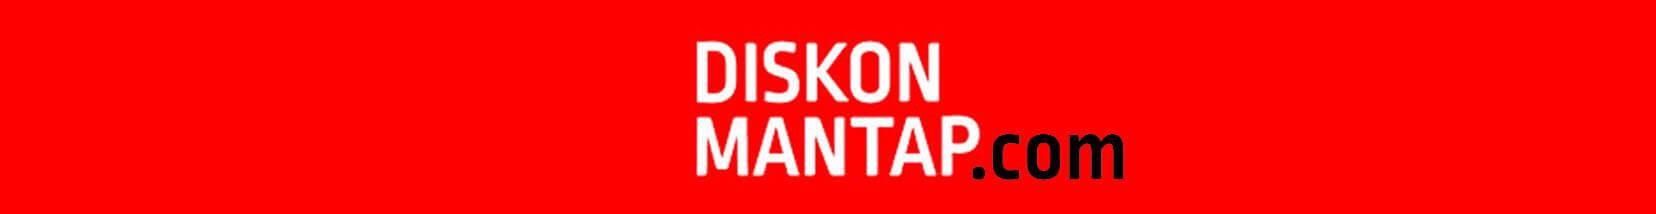 Diskon Mantap